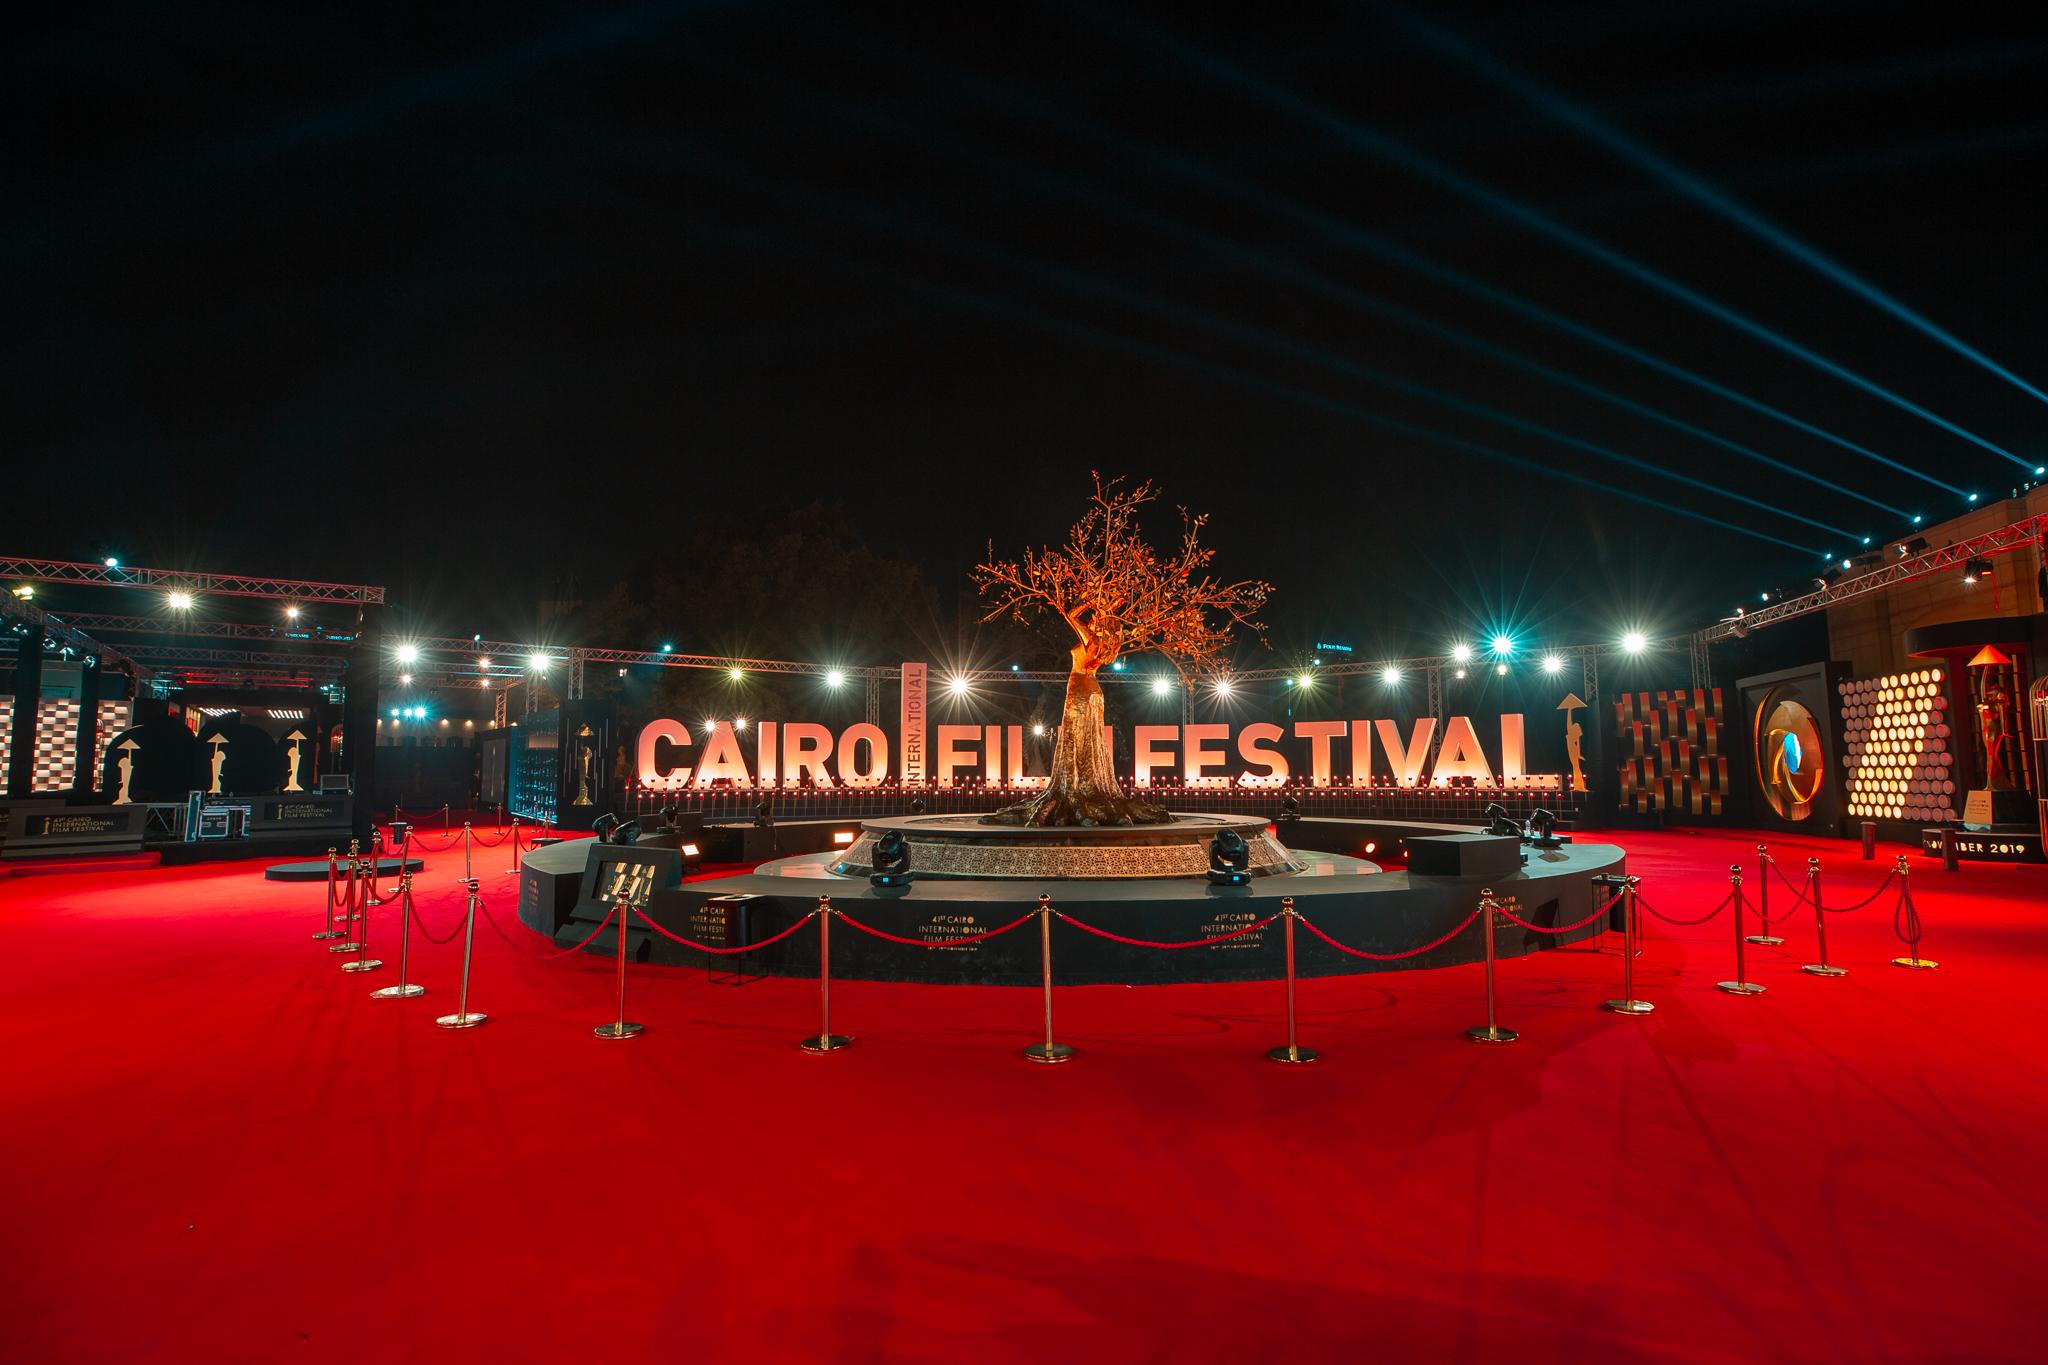 Cairo Film Festival